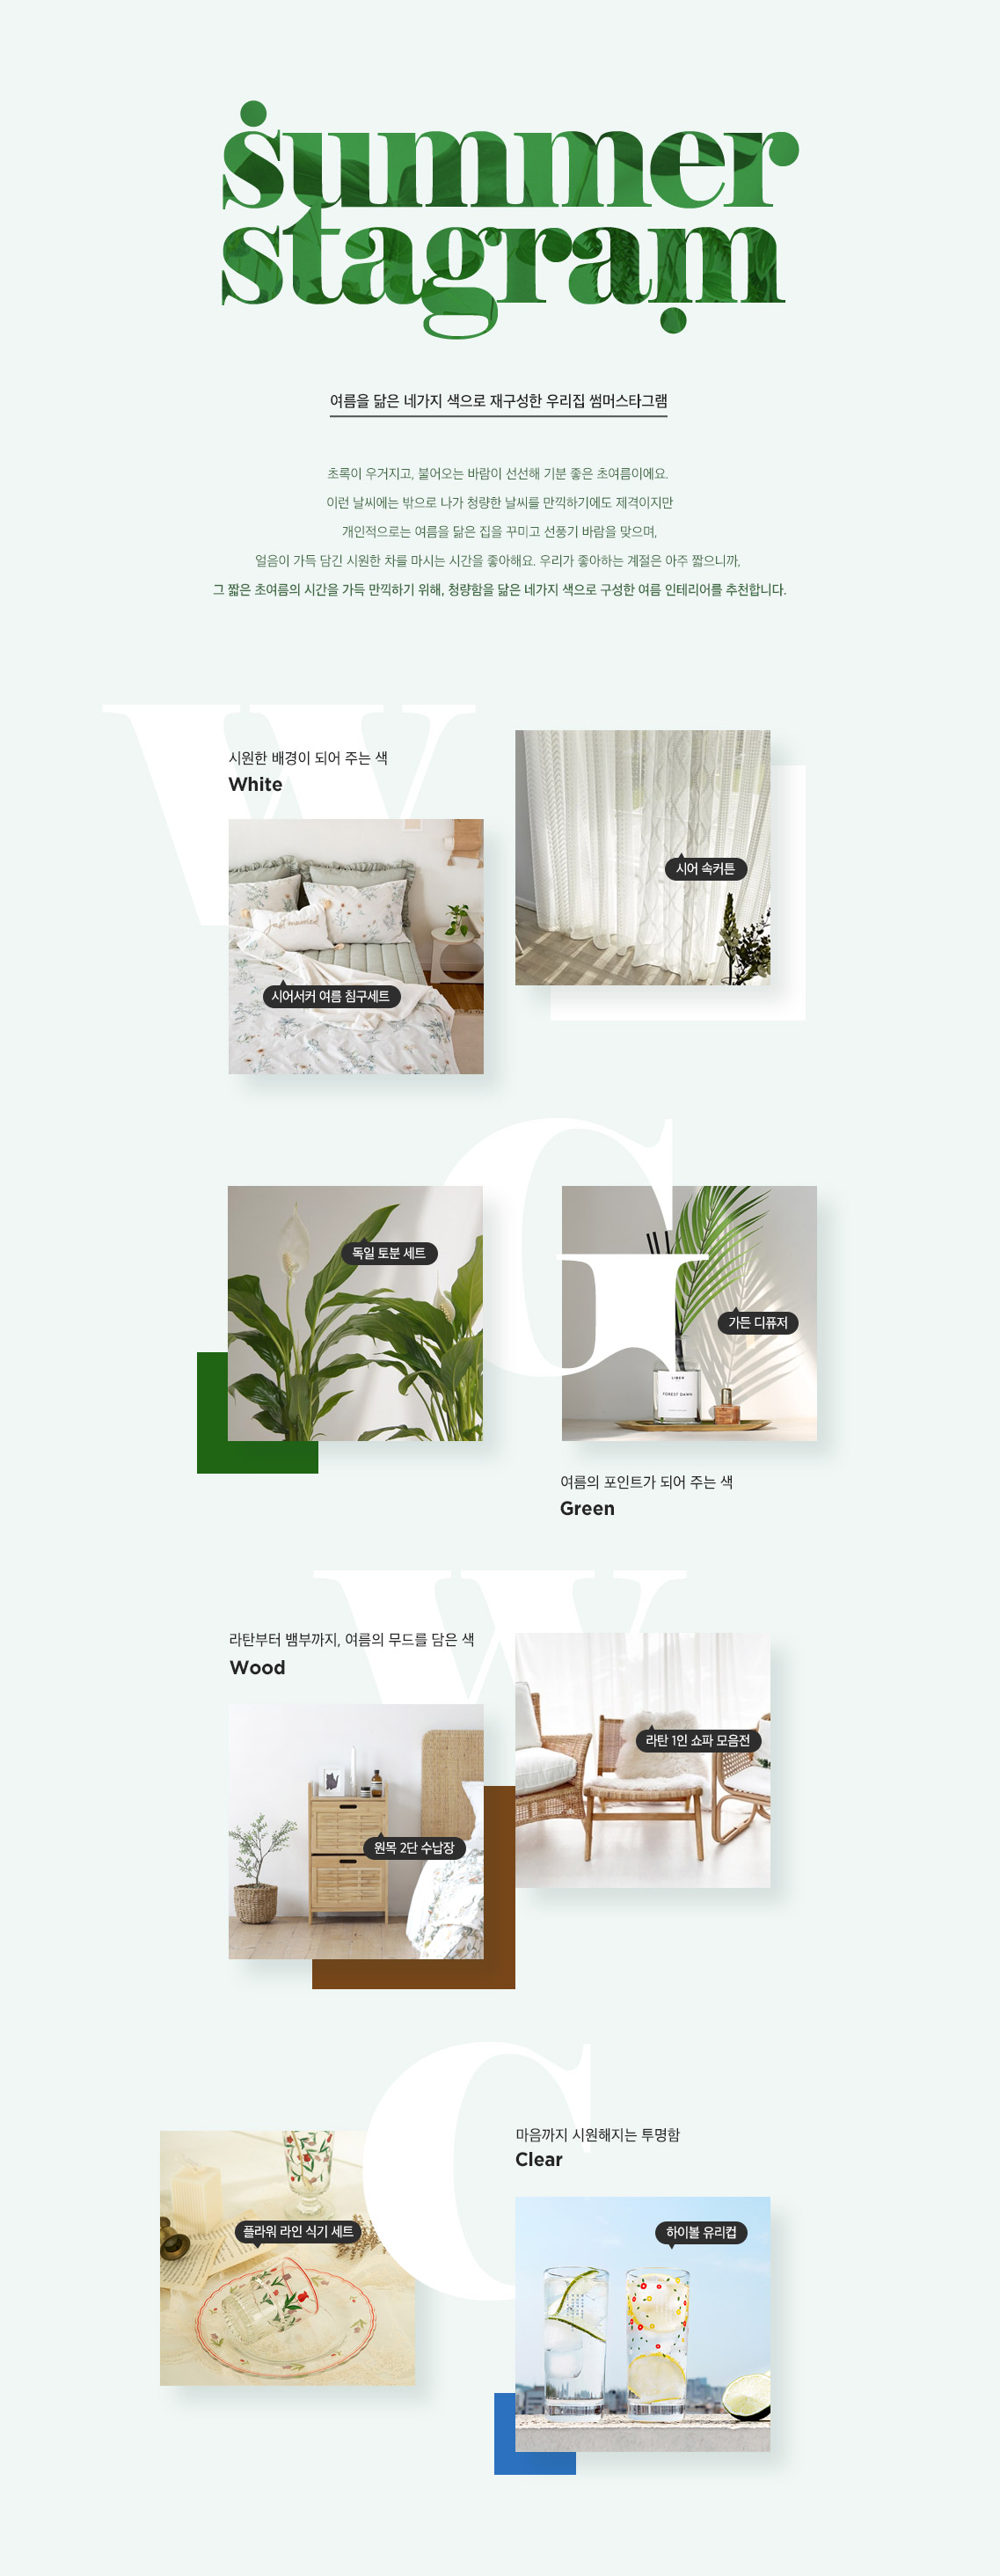 10x10 Room Design: Banner 上的釘圖